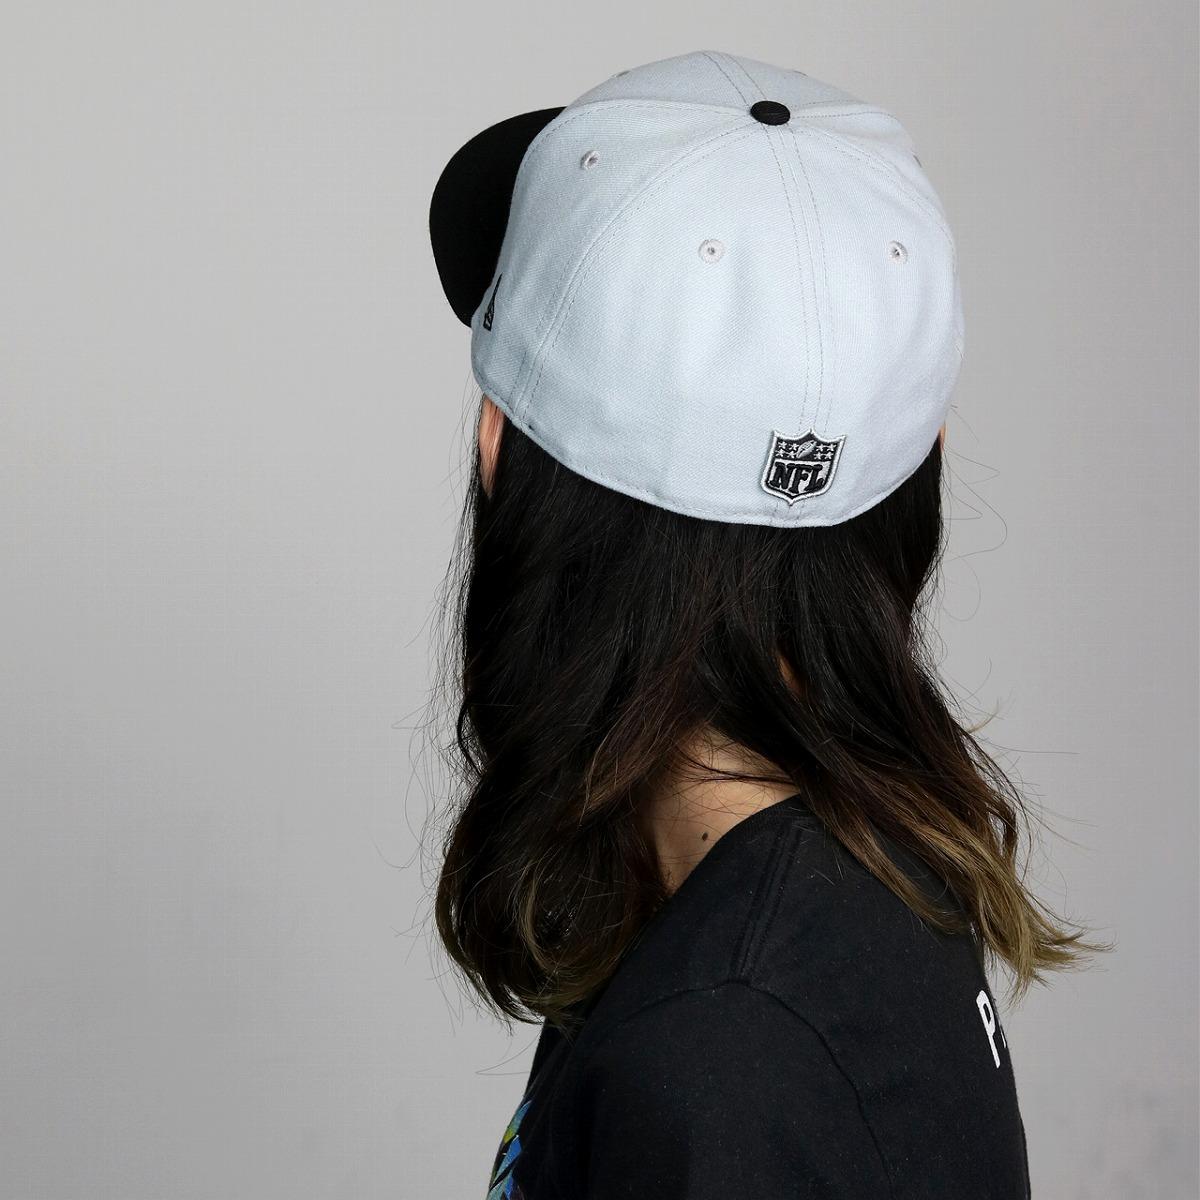 a008df514cc NEWERA cap men new gills new era 59FIFTY Oakland Raiders size richness  small shark size grain back logos treat fashion men brand   gray black X  team color ...